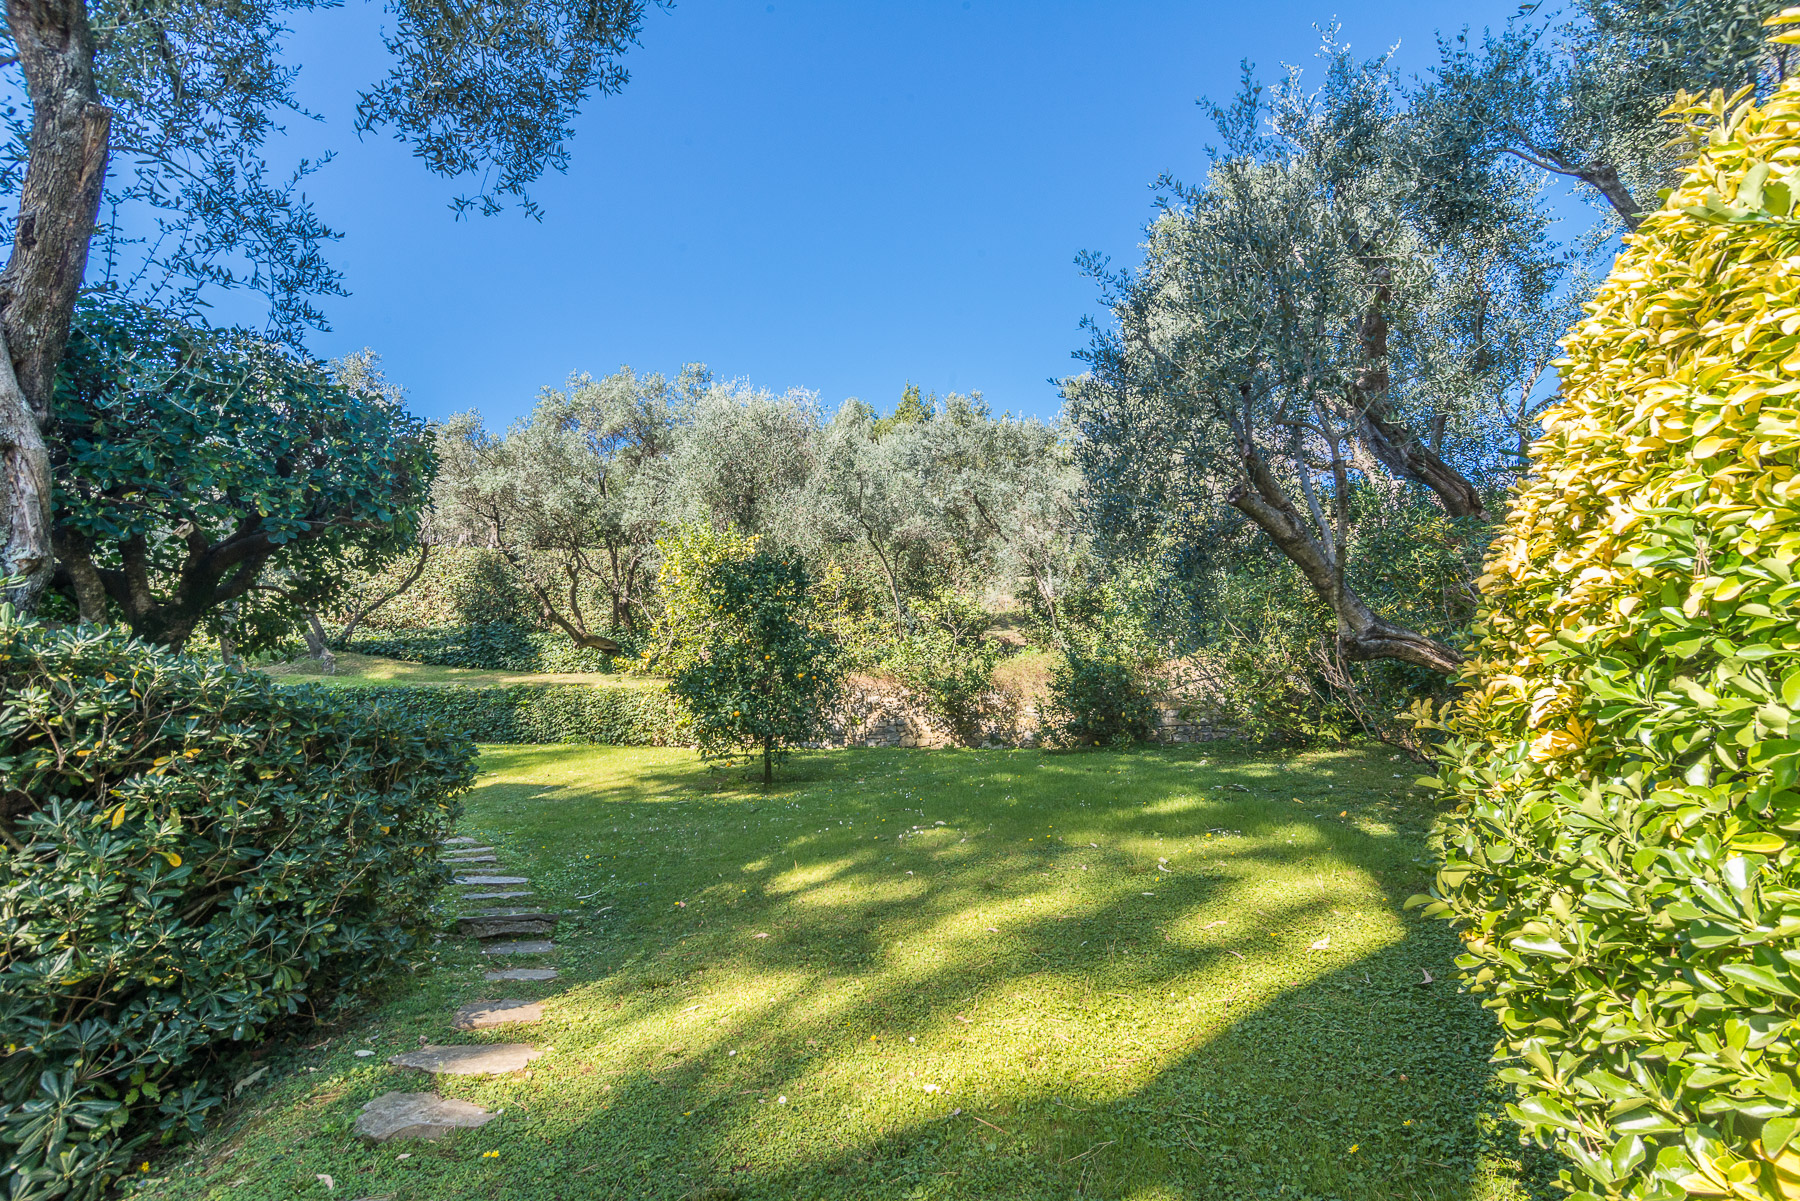 Villa in Vendita a Santa Margherita Ligure: 5 locali, 440 mq - Foto 20